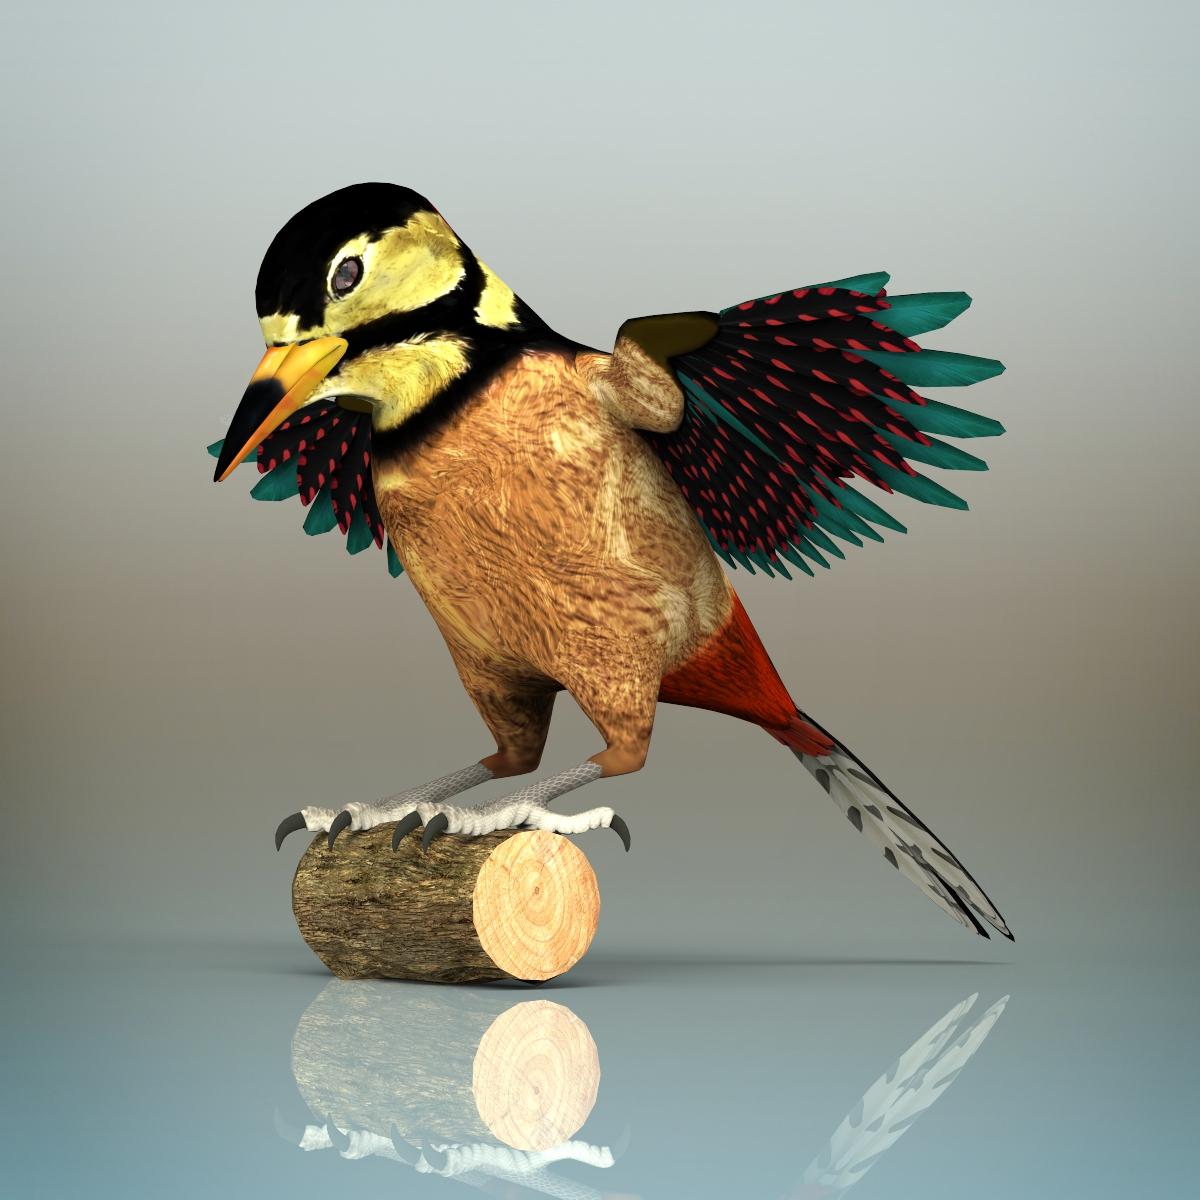 Woodpecker Bird By Deepocean3d 3docean